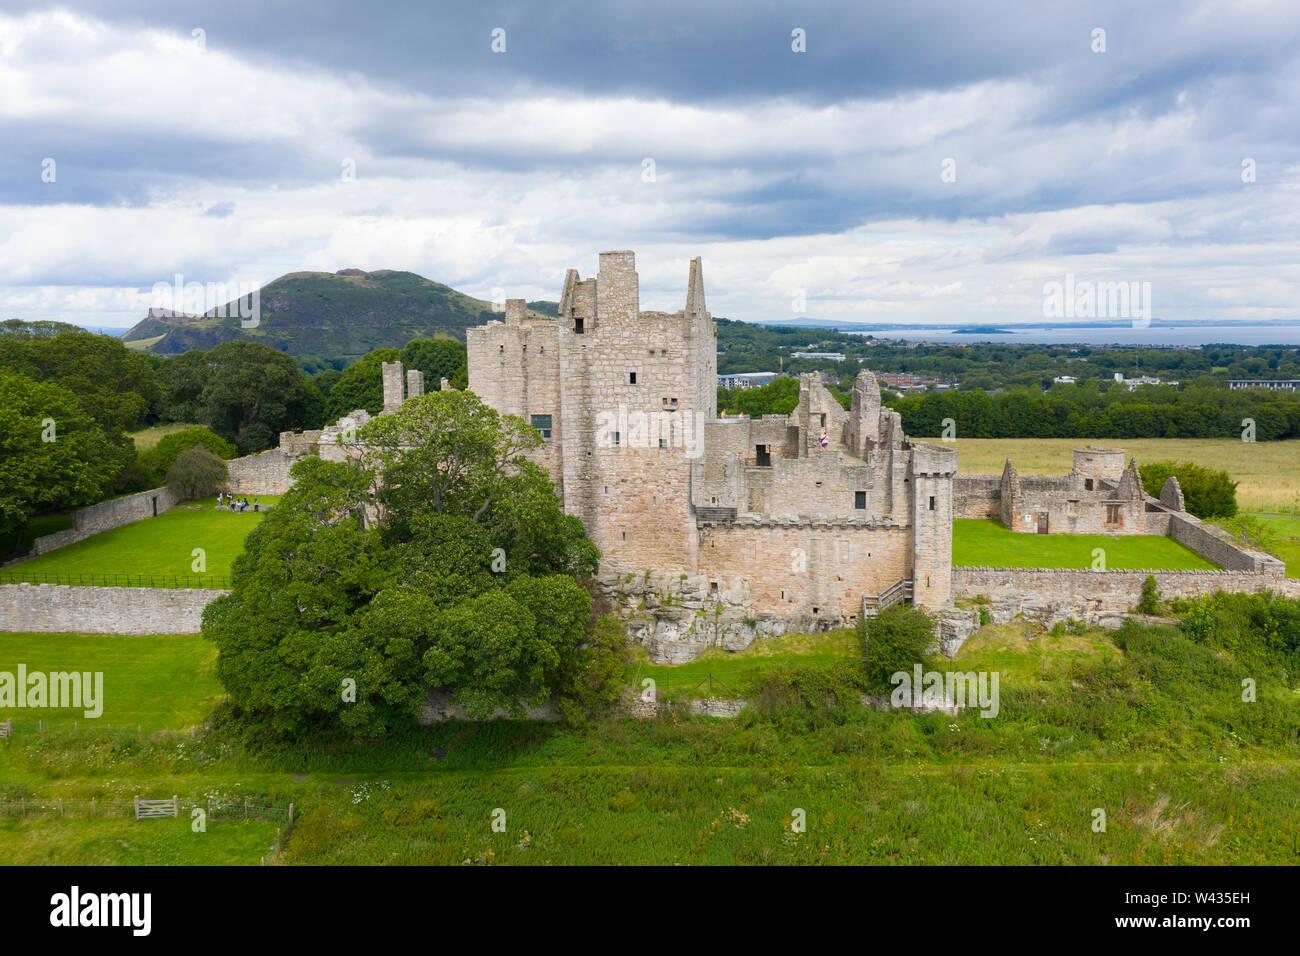 Elevated view of Craigmillar Castle in Edinburgh, Scotland UK. Stock Photo